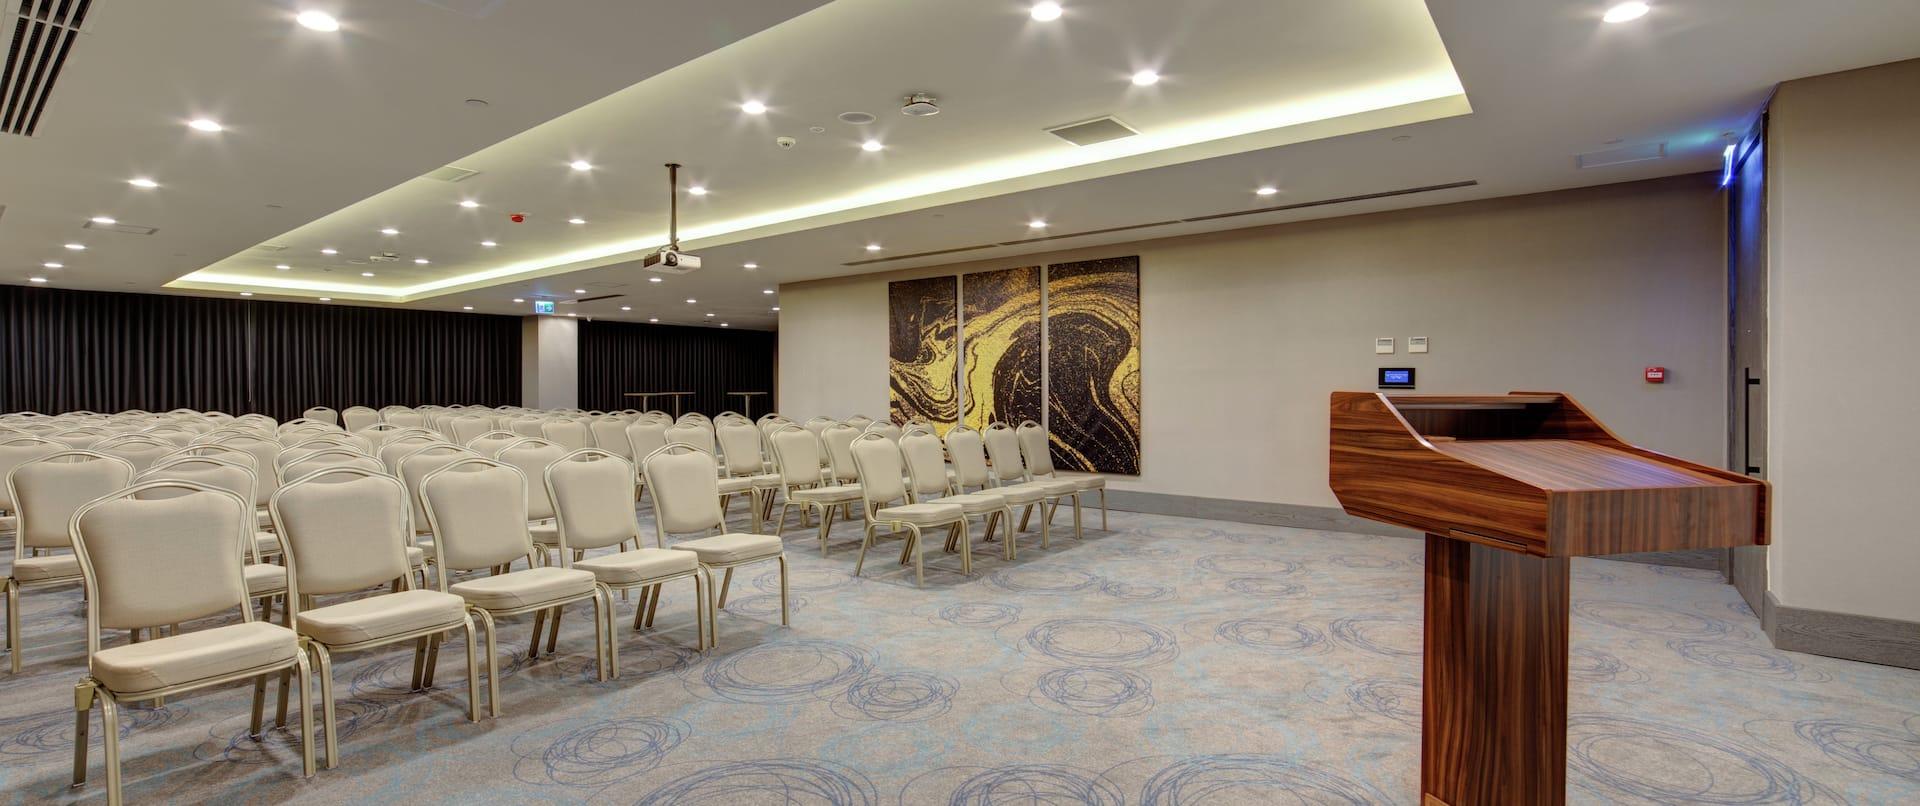 Kilikya Meeting Room